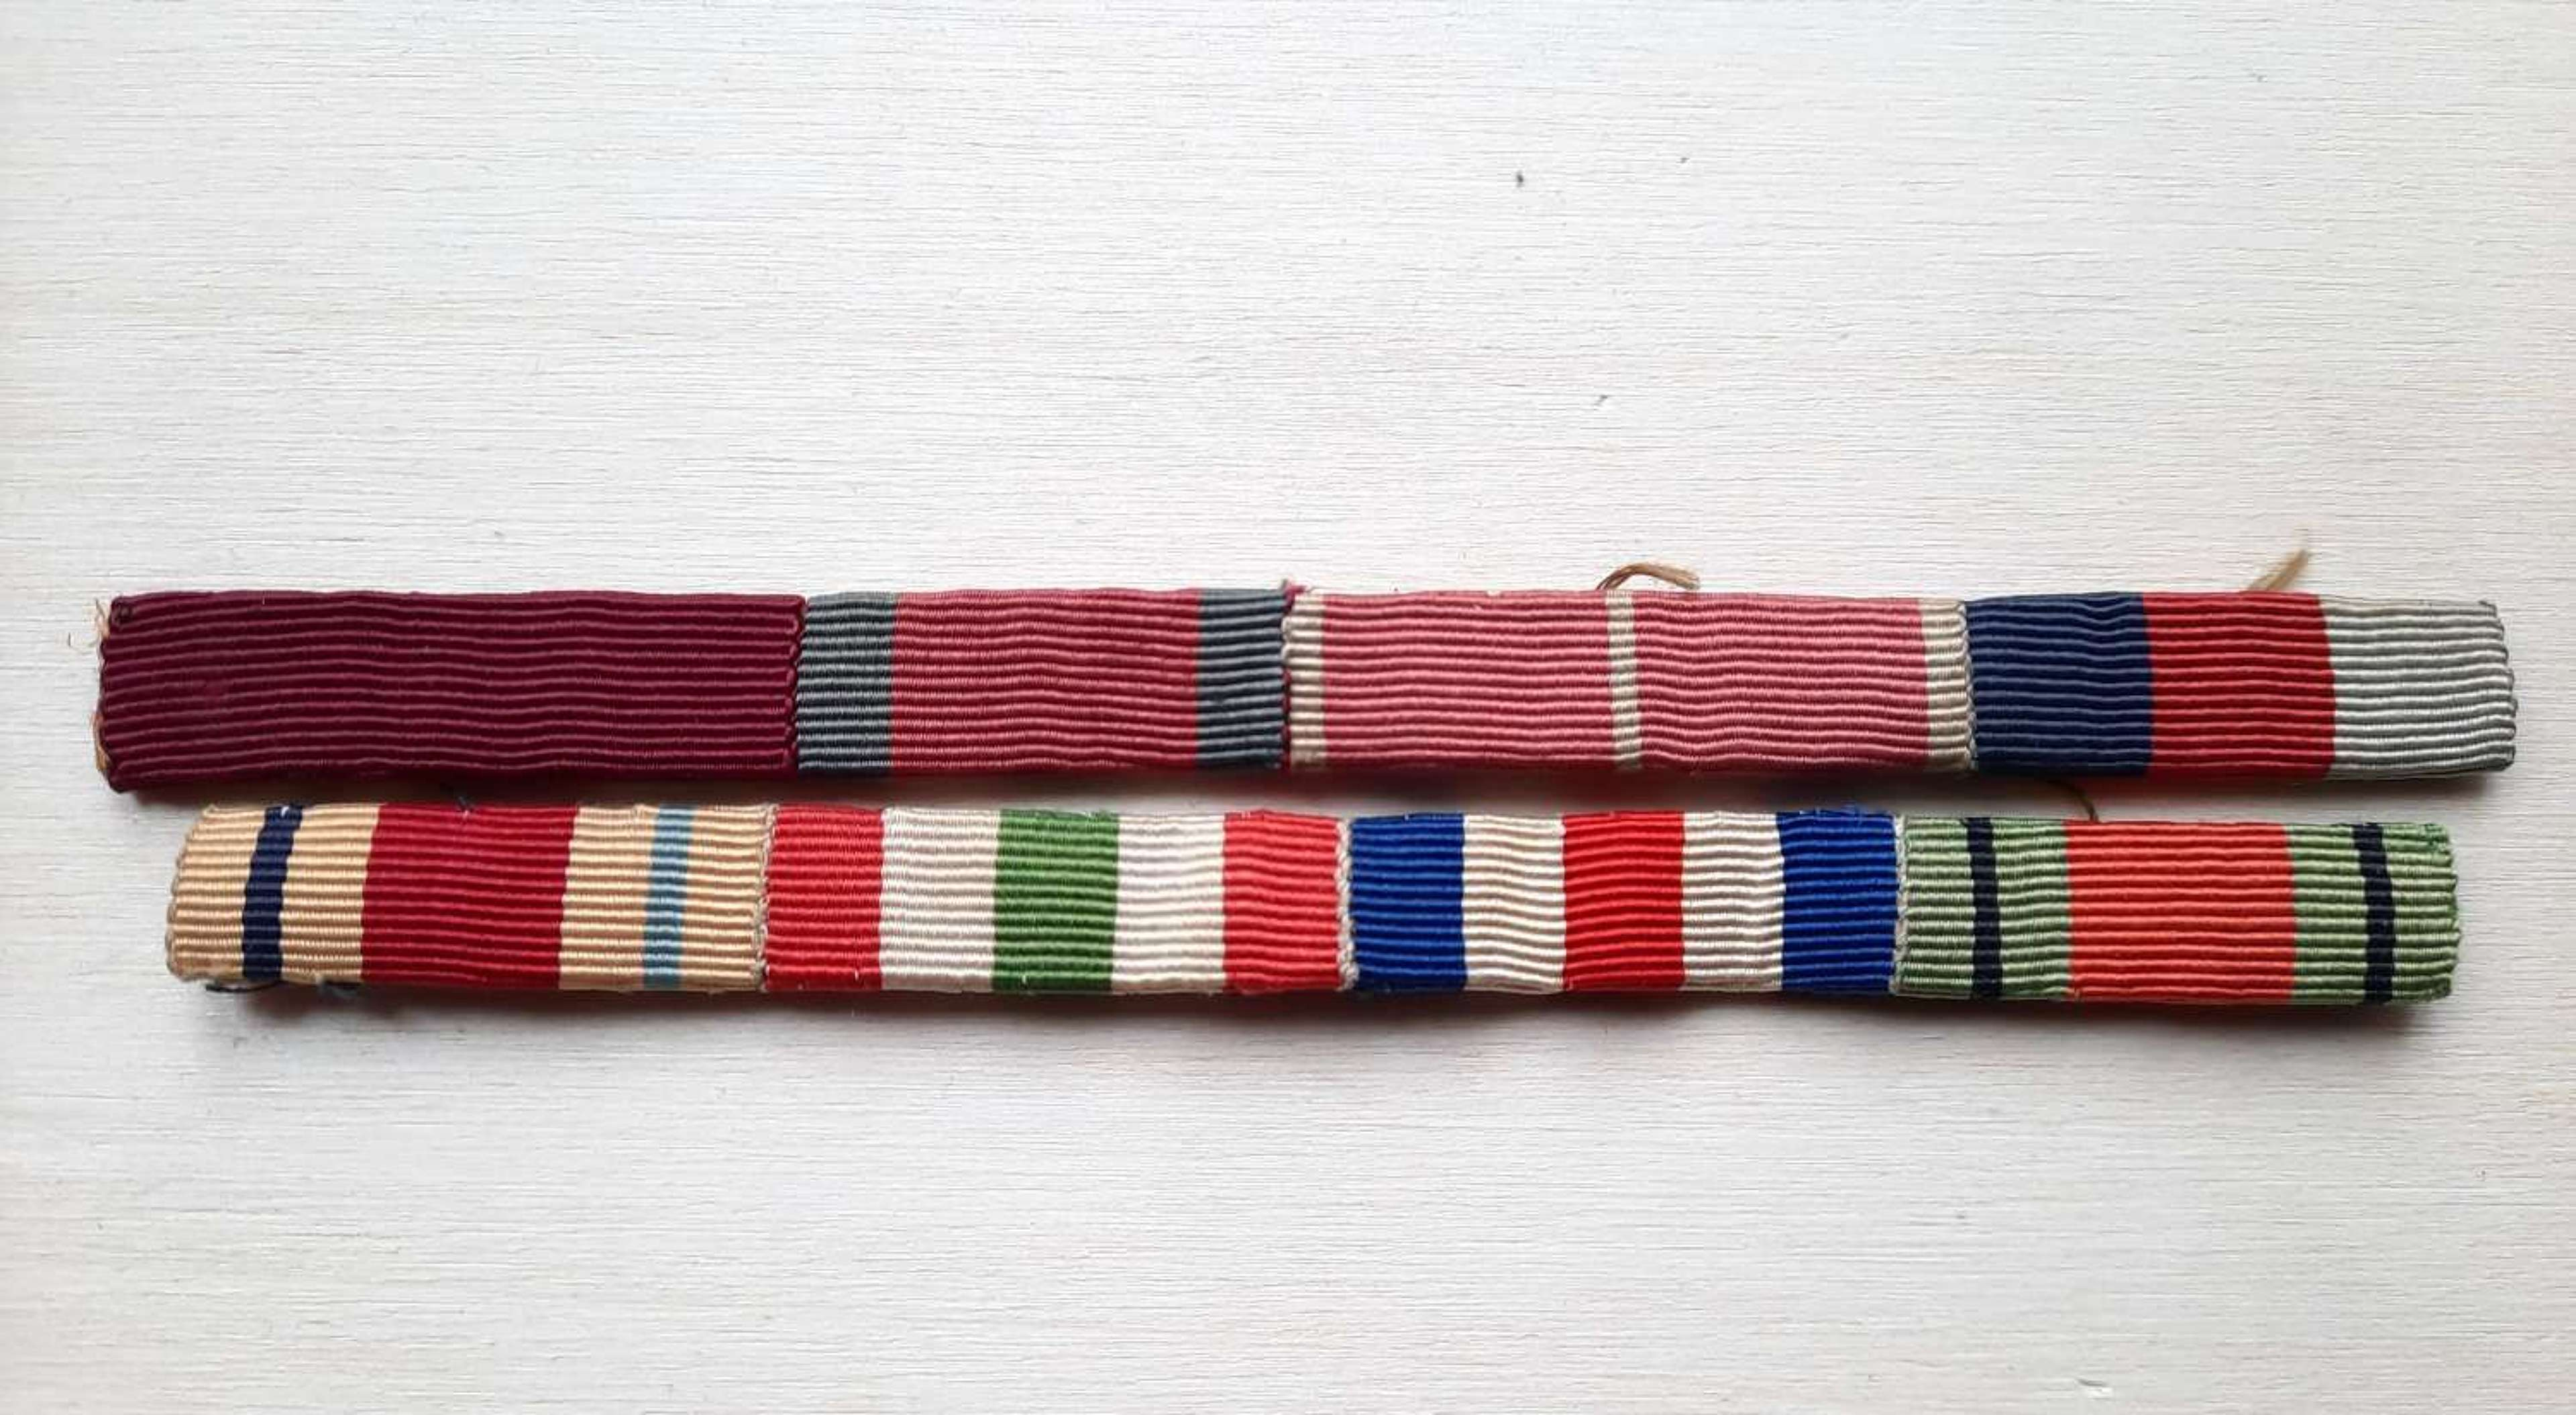 Order of the Bath Medal Ribbon Bar